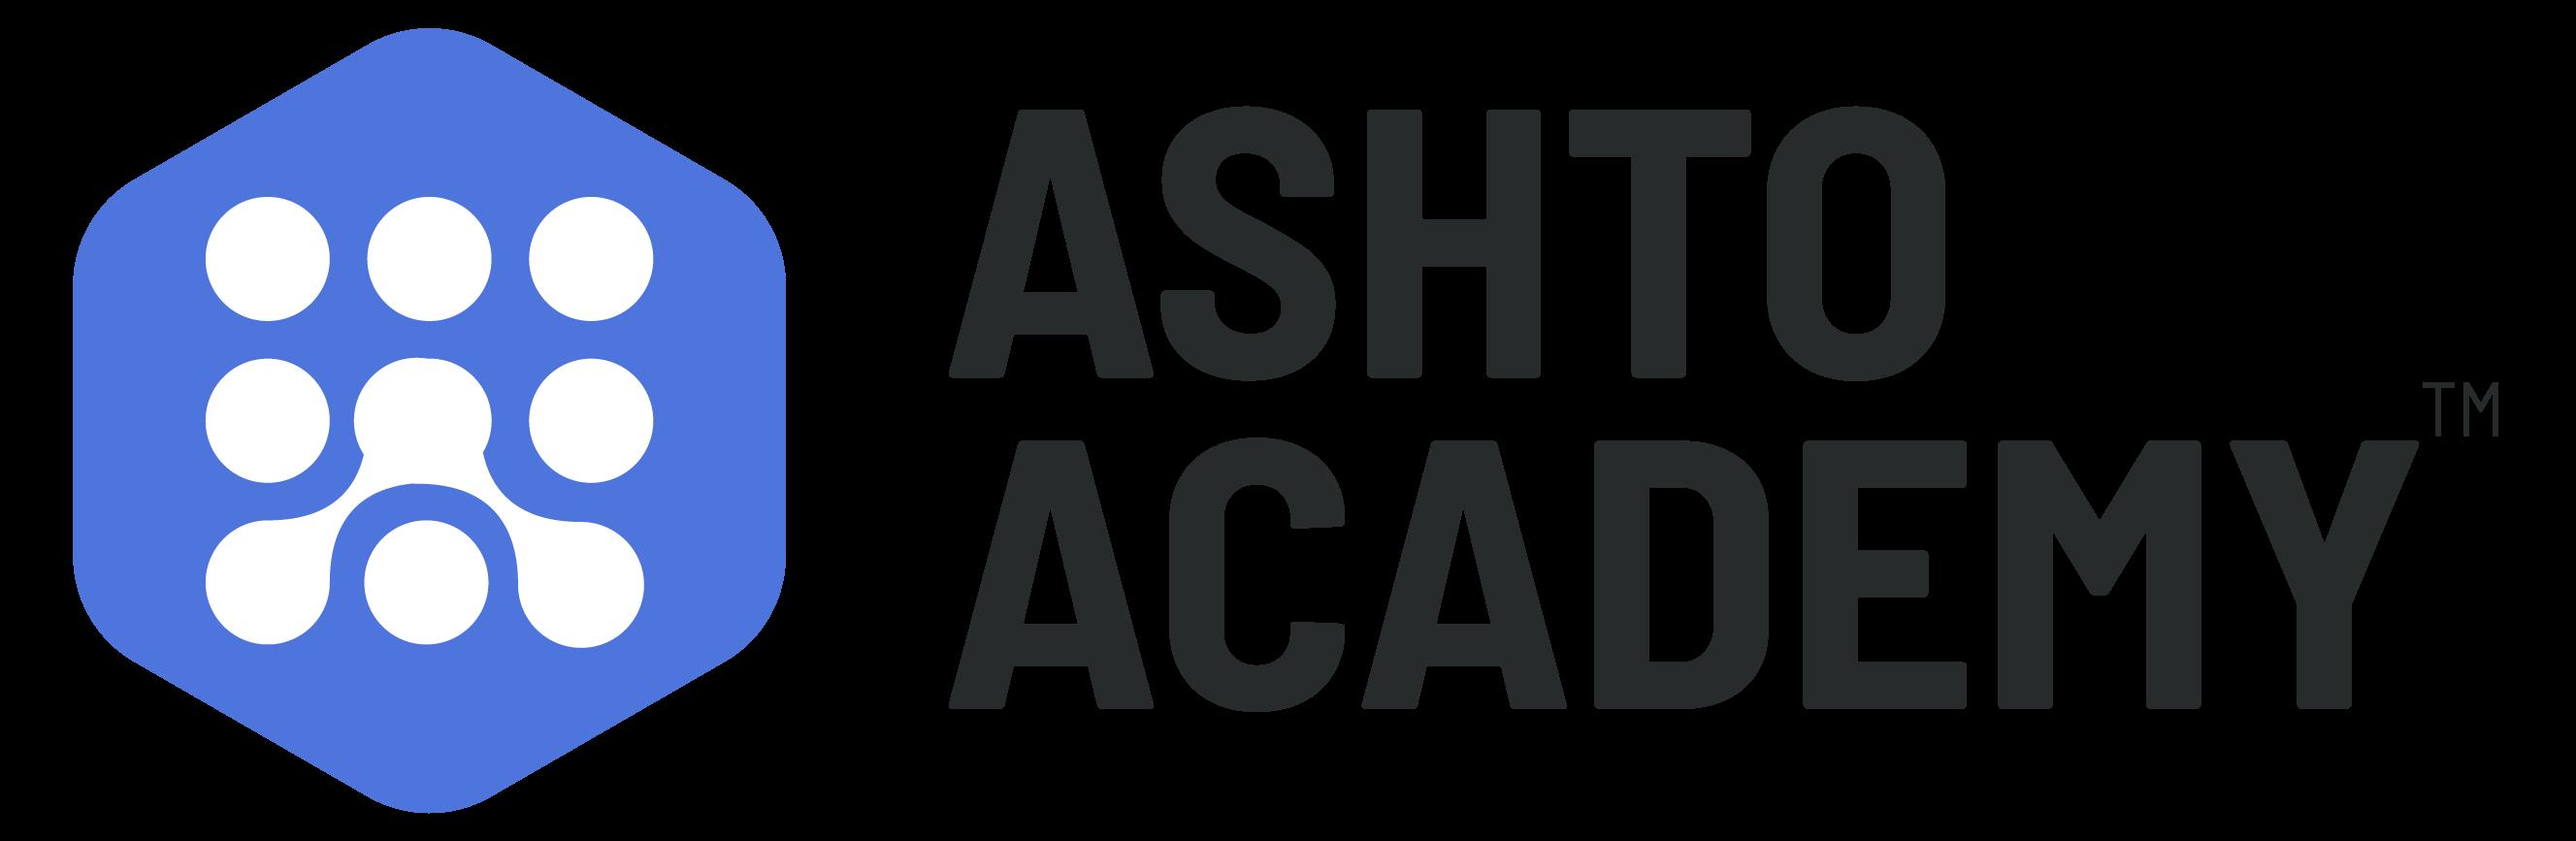 Ashto Academy Logo